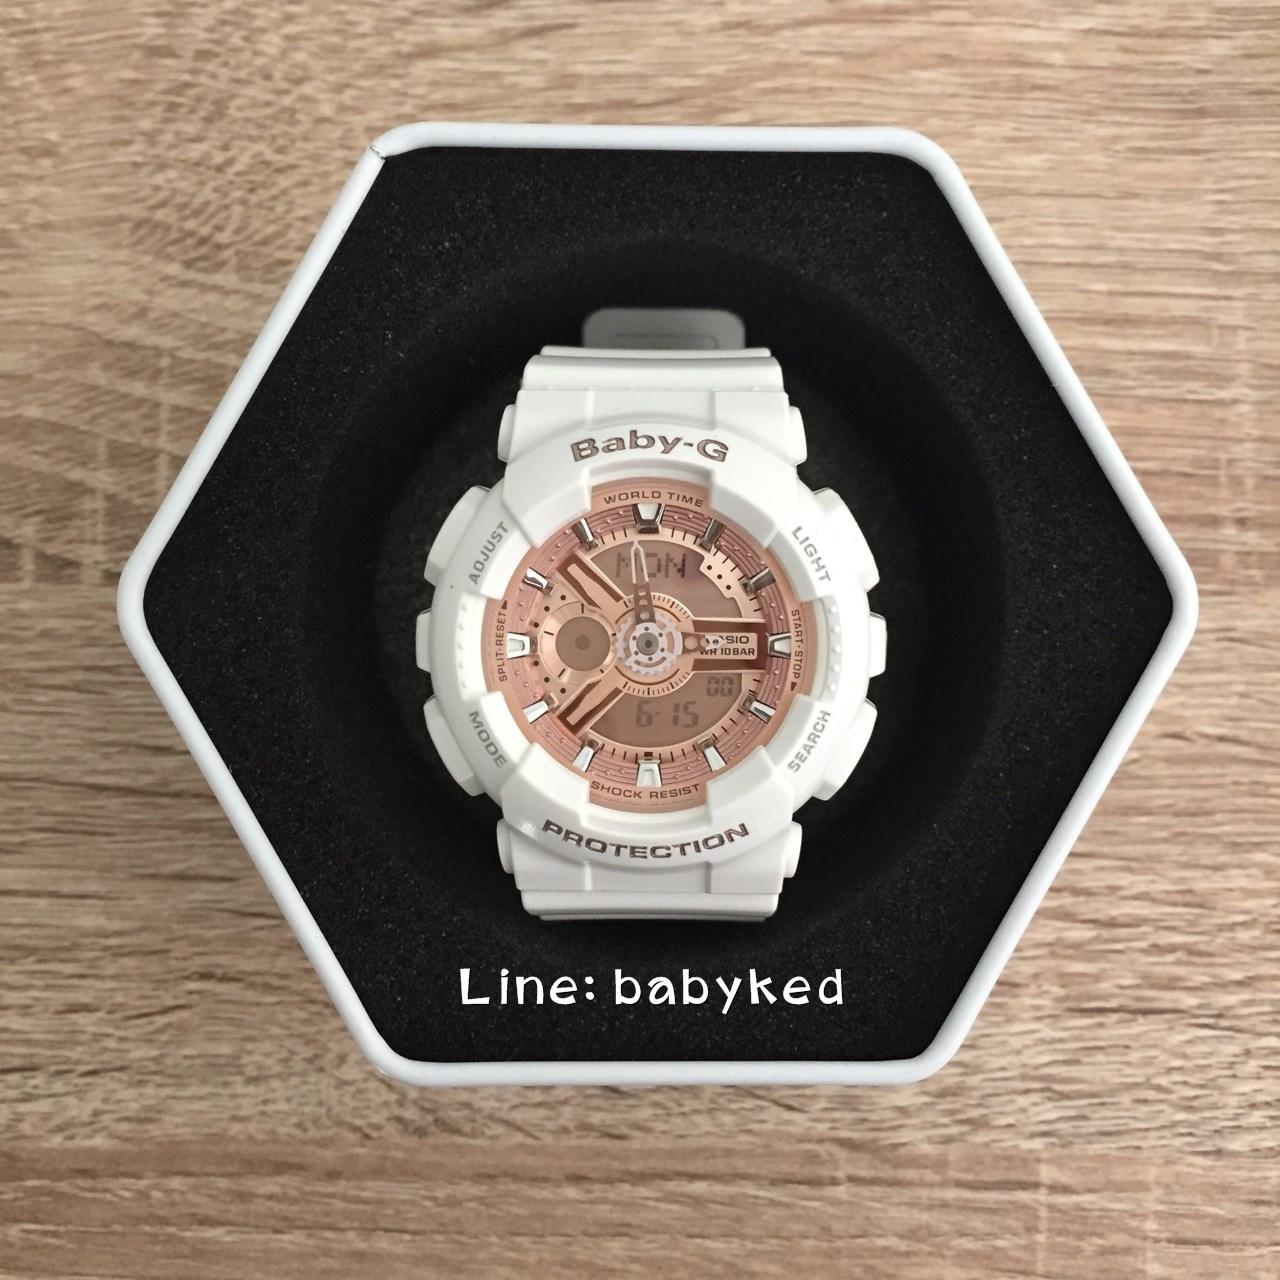 Baby-G BA-110-7 สีขาวพิงค์โกล ของแท้100% ของใหม่อุปกรณ์ครบ 3,900 บาท